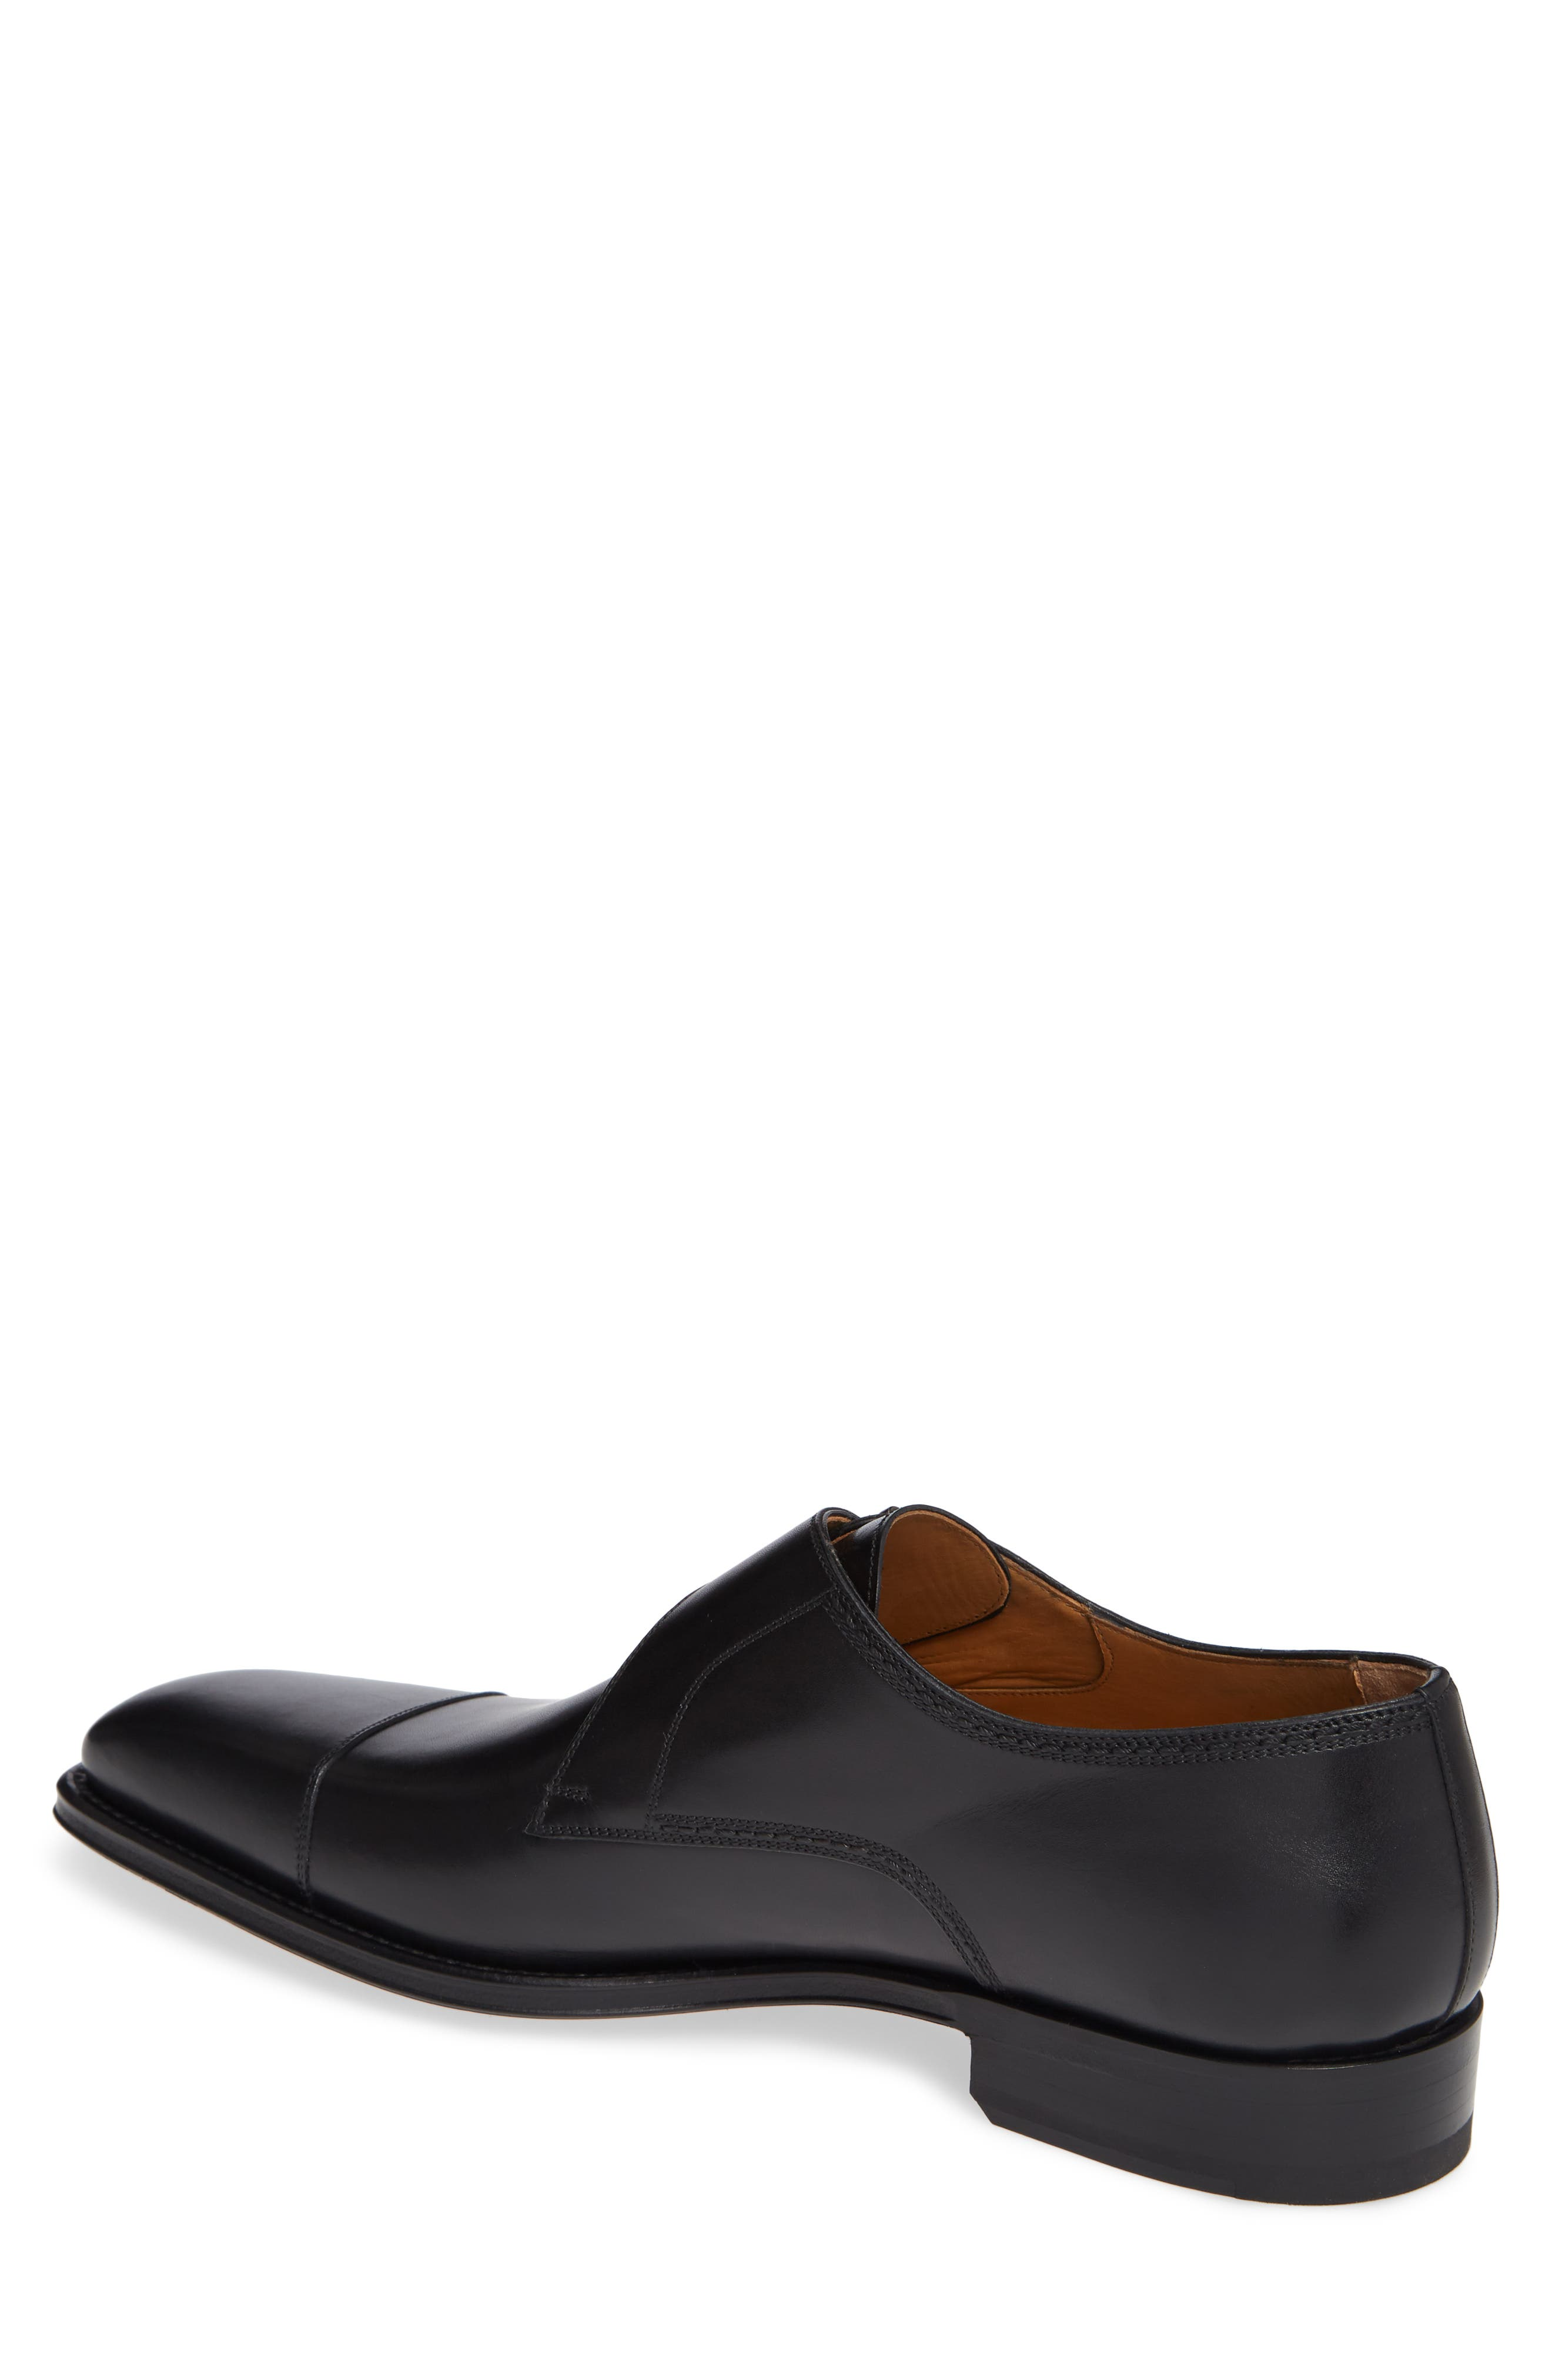 Lennon Monk Strap Shoe,                             Alternate thumbnail 2, color,                             001